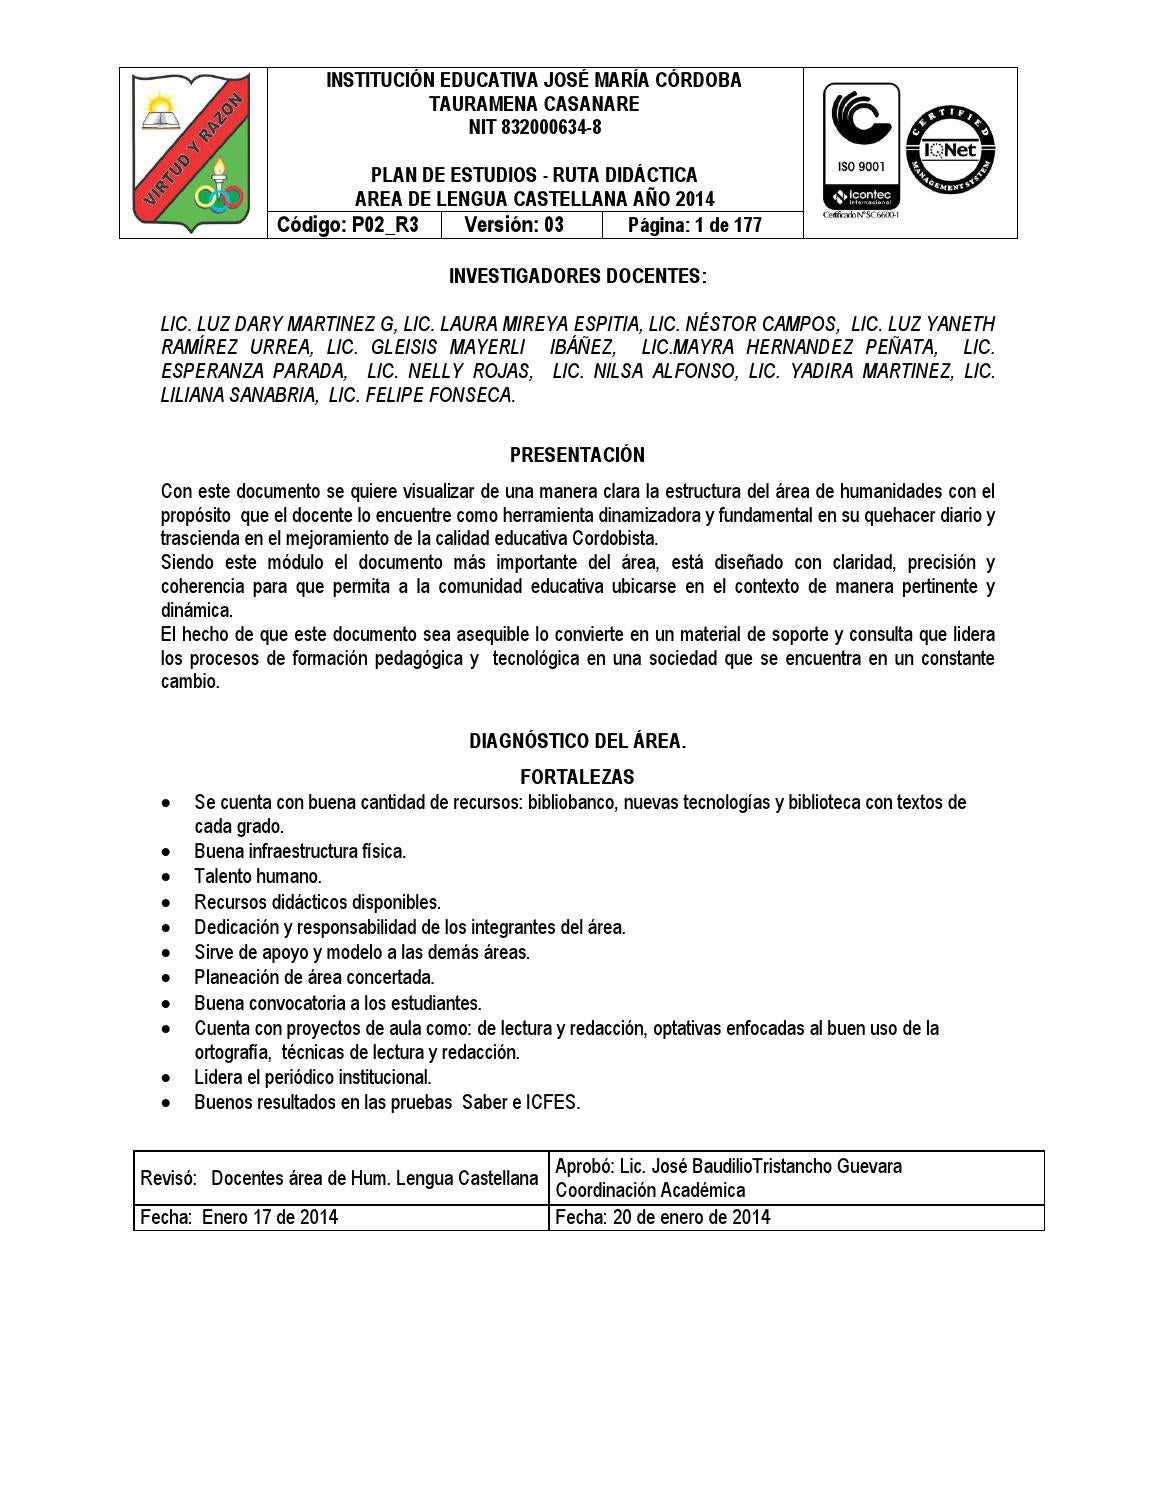 P02 r3 plan de estudios rea de hum lengua castellana 2014 by luiszaratez issuu - Anos luz castellana ...